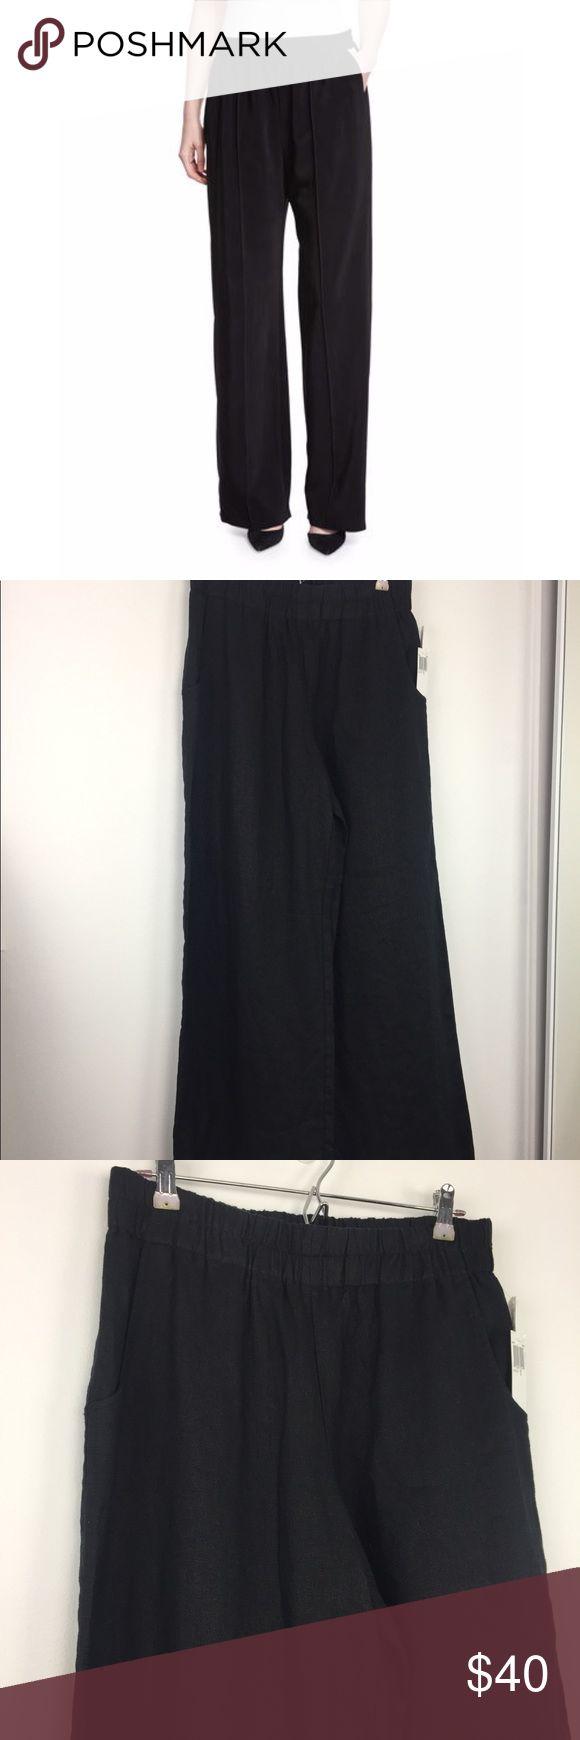 "Neiman Marcus Black Wide Leg Linen Pants Neiman Marcus Wide Leg Black Linen Pants.  NWT.  100% Linen.  Approx 29"" inseam.  E2 Neiman Marcus Pants Wide Leg"